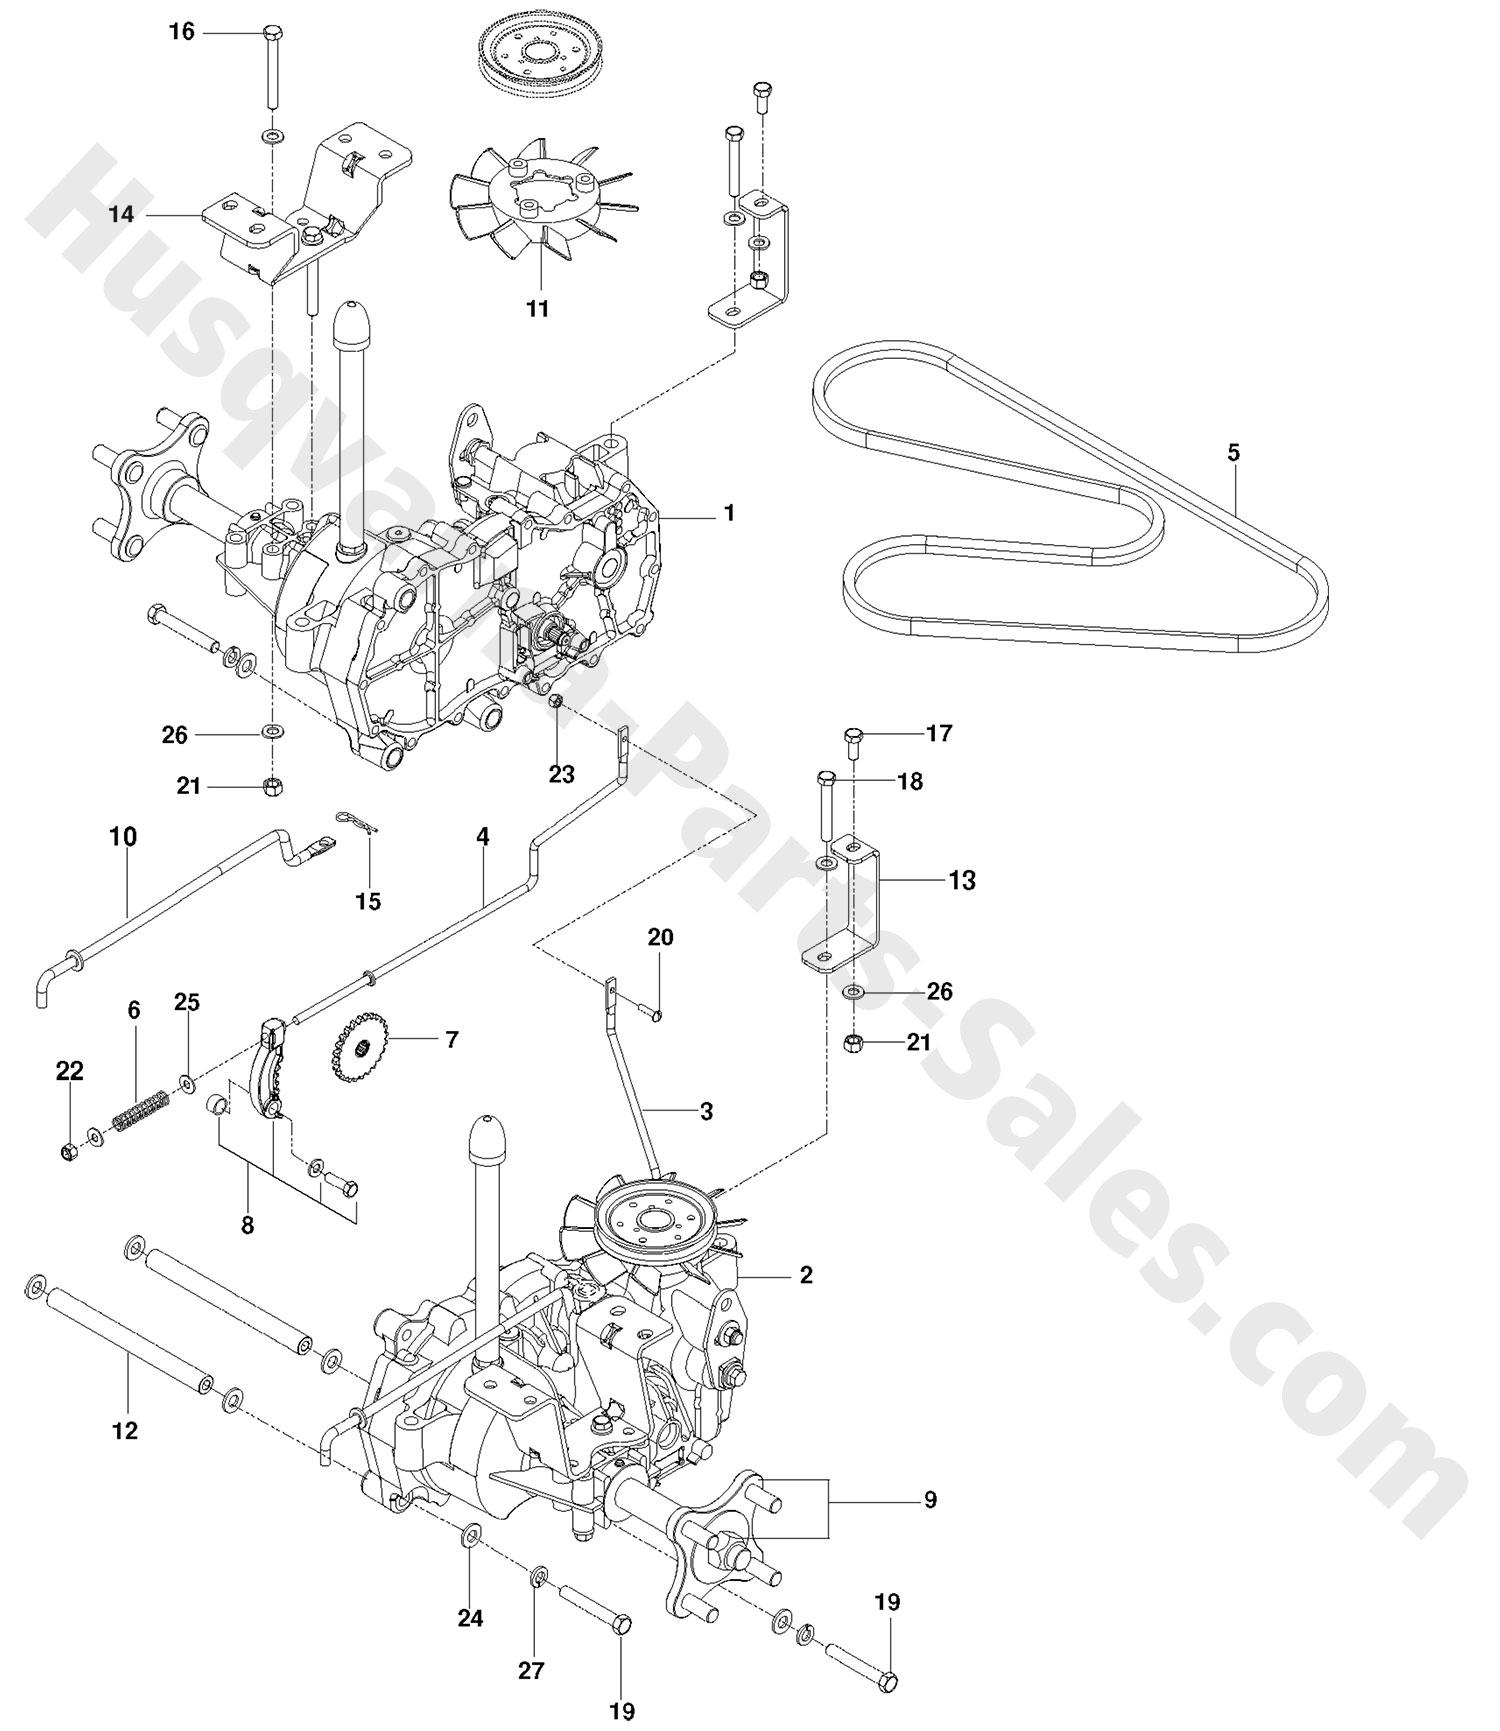 Rz4623 Husqvarna Ztr Mowers Hydraulic Pump Motor Parts